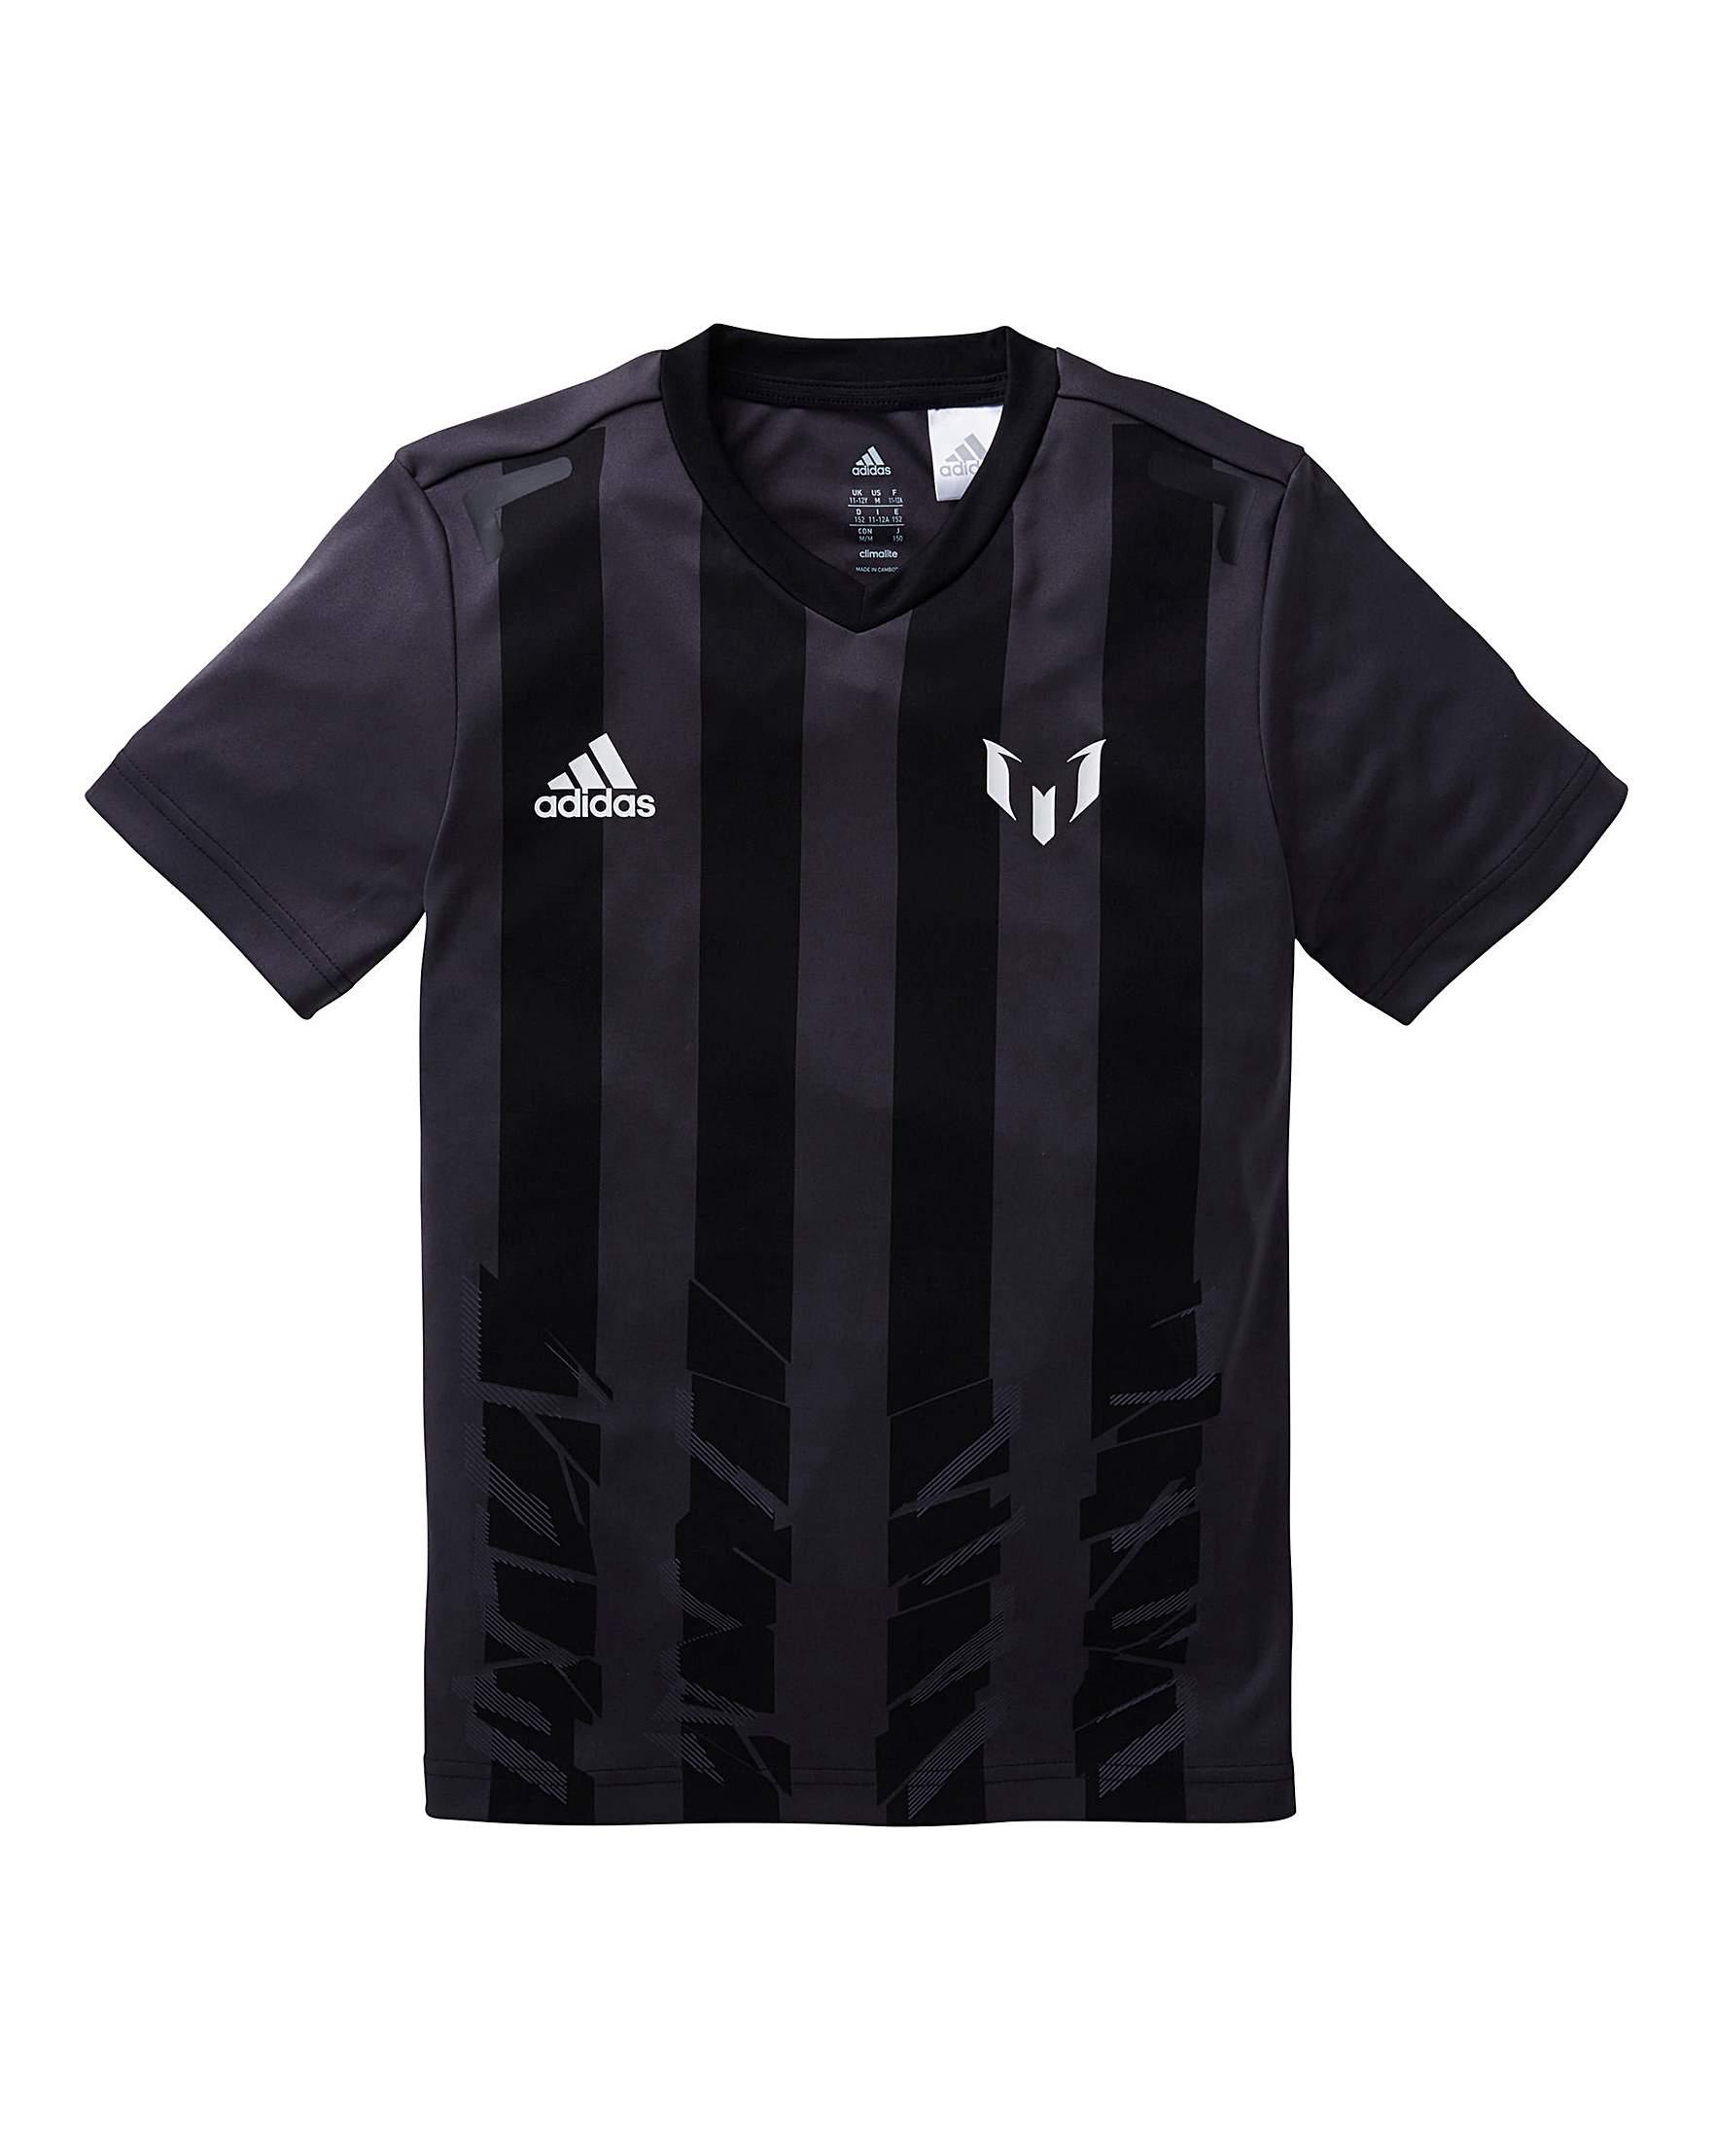 d17be6b551 adidas Youth Boys Messi Icon T-Shirt